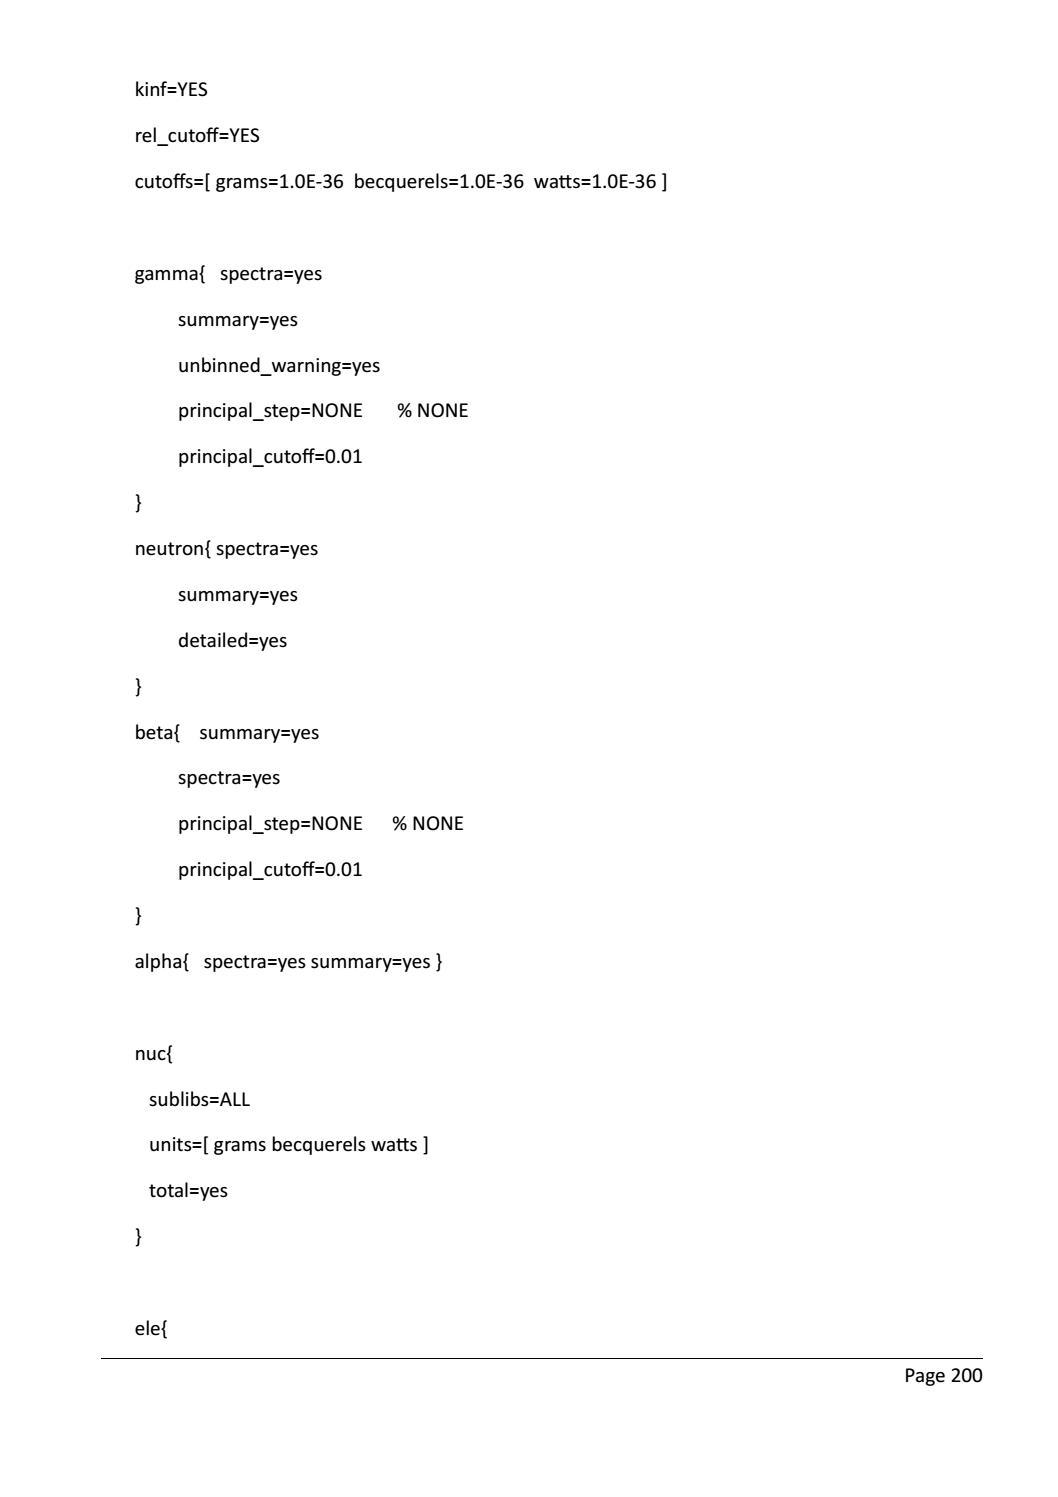 RADIOACTIVE WASTE: COMPUTATIONAL CHARACTERISATION and SHIELDING page 225